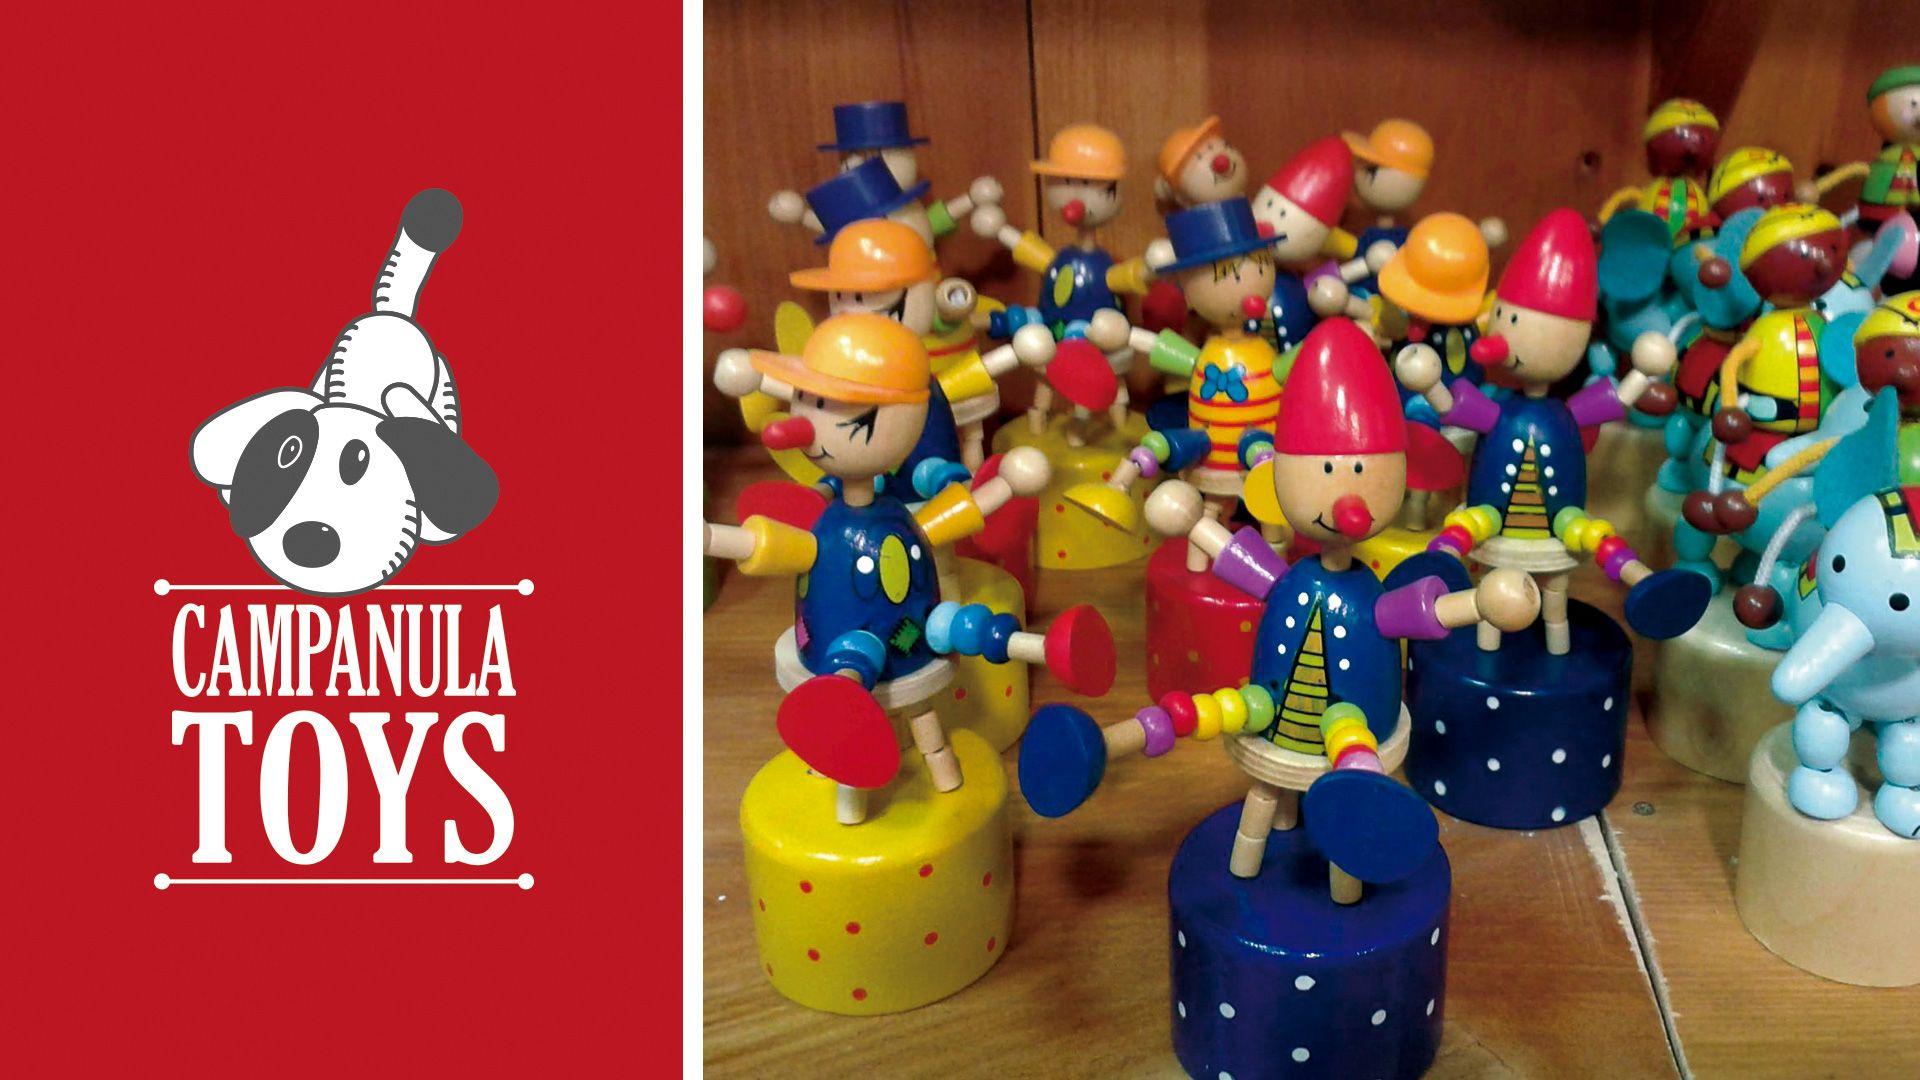 Campanula Toys identidad corporativa